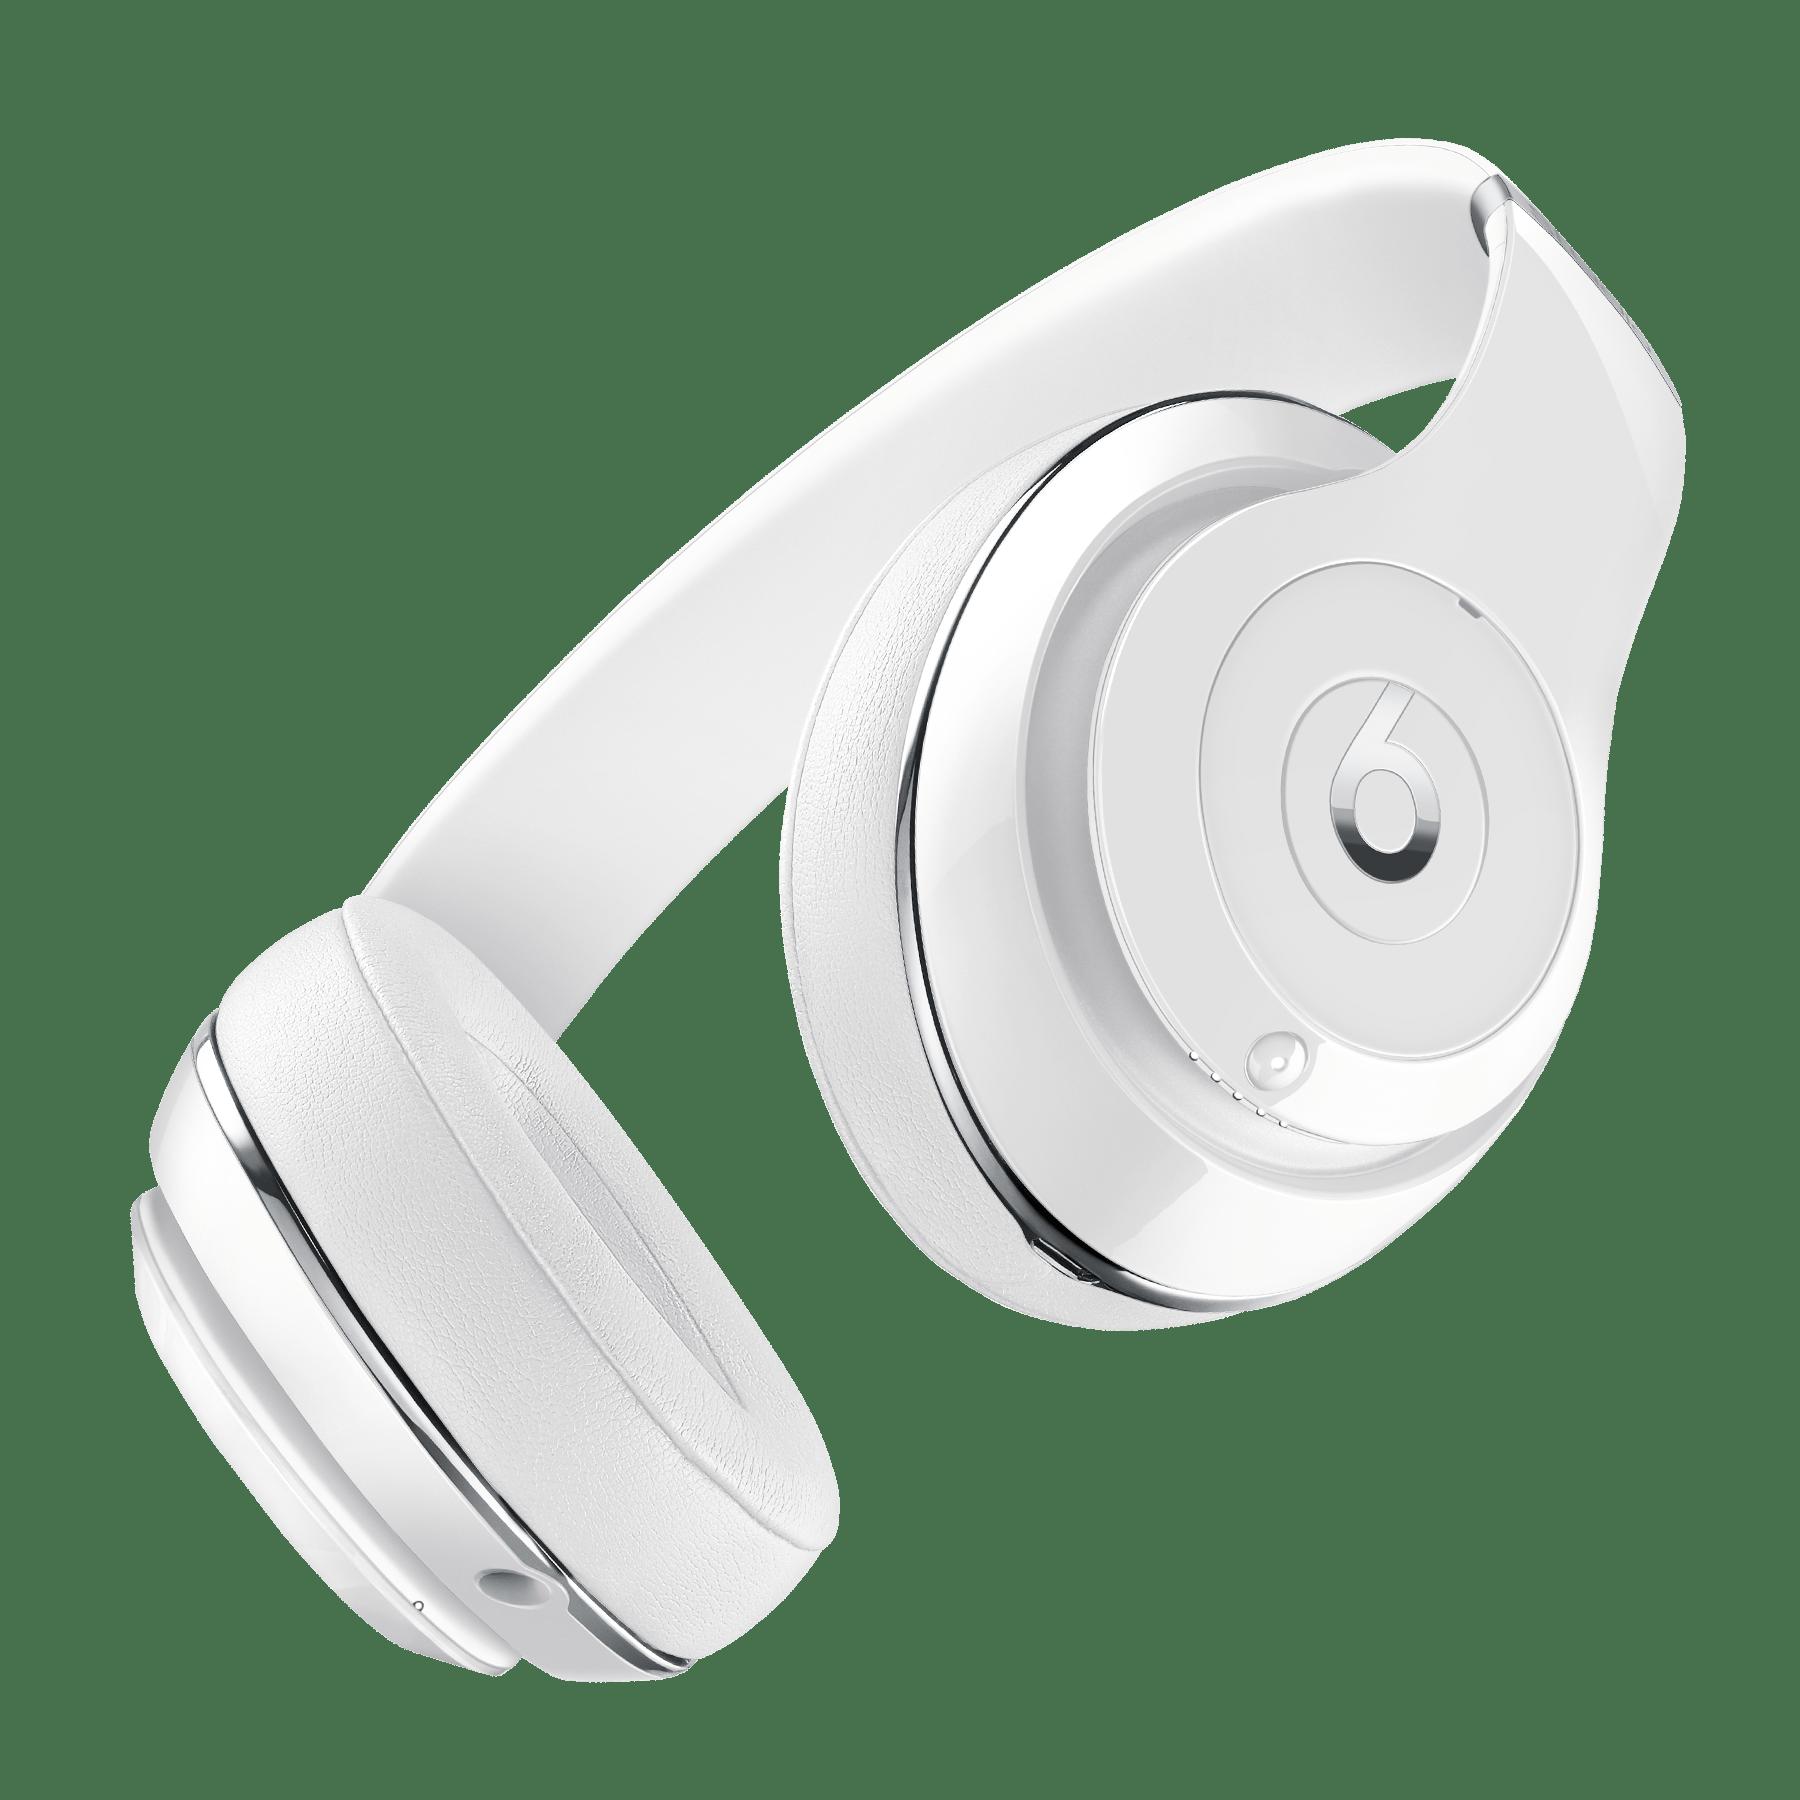 Beats Studio Wireless Bluetooth Headphones By Dre Headphone Beat Drdre